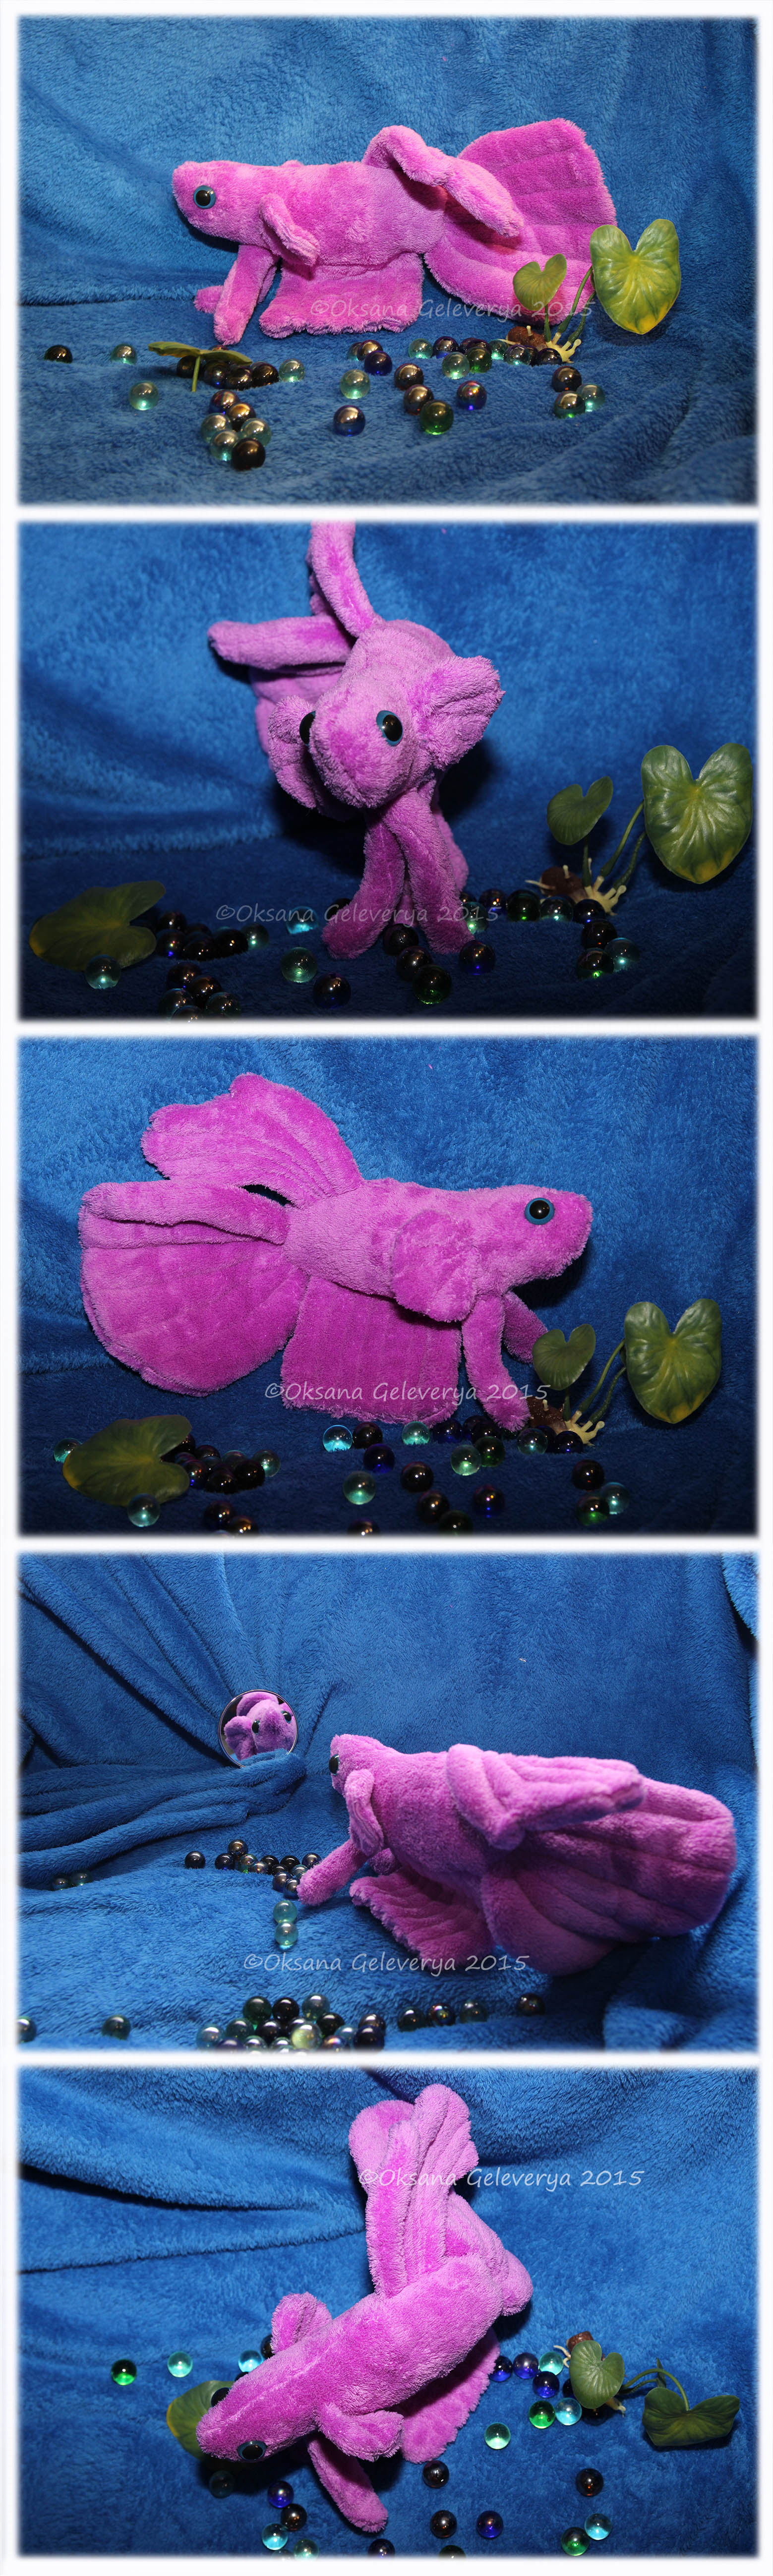 Betta fish plush pet by oksana007 on deviantart for Betta fish toys